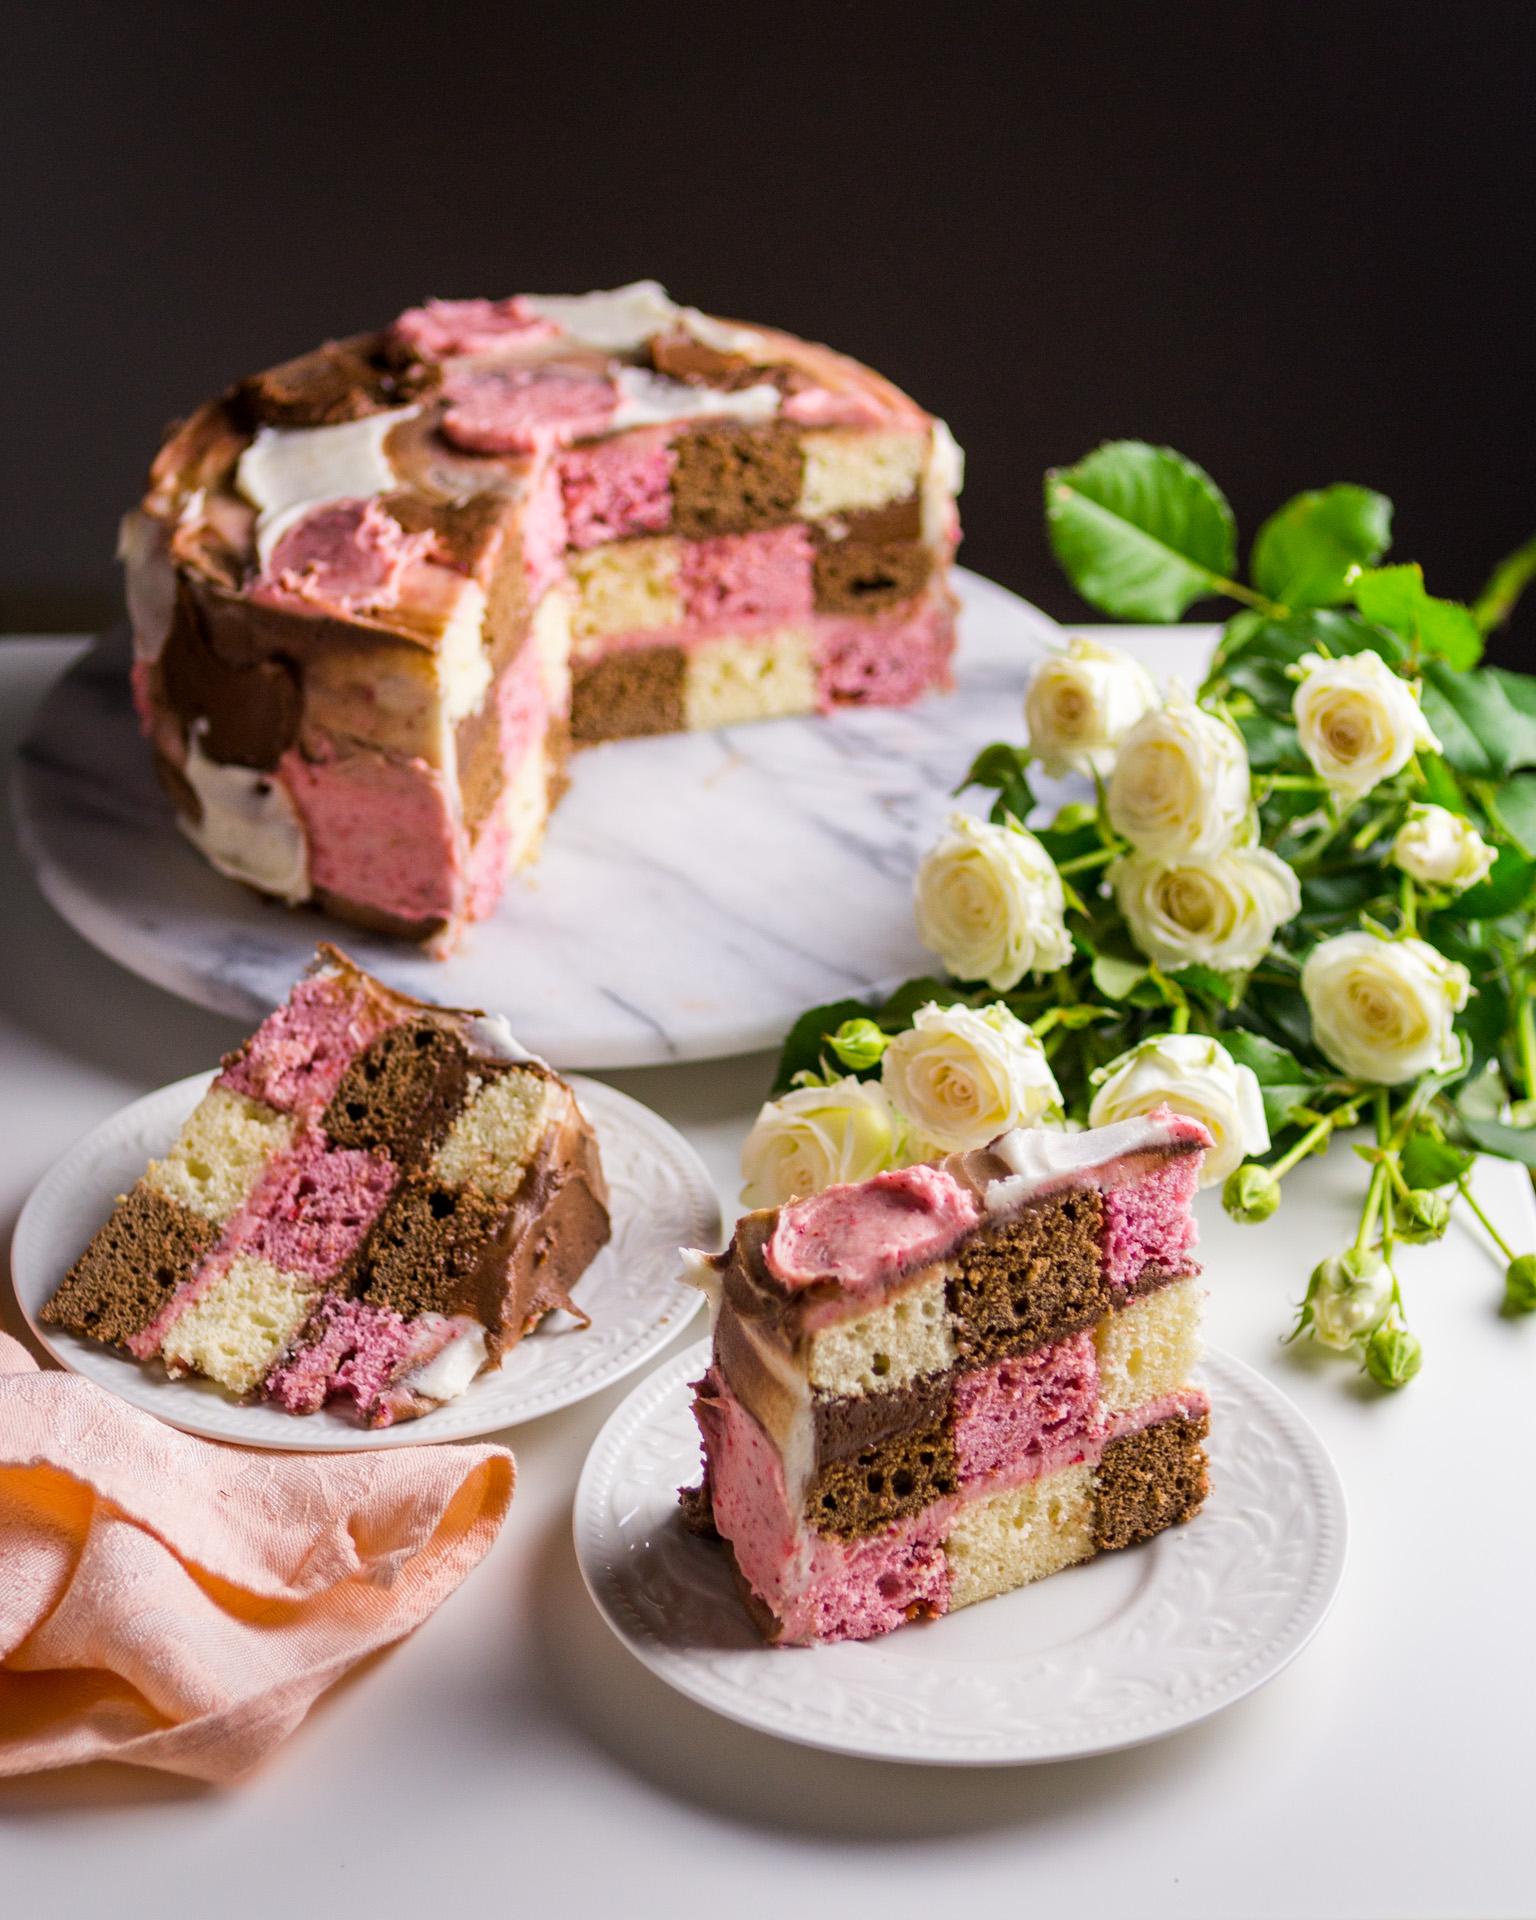 neapolitan-checkered-cake-12.jpg